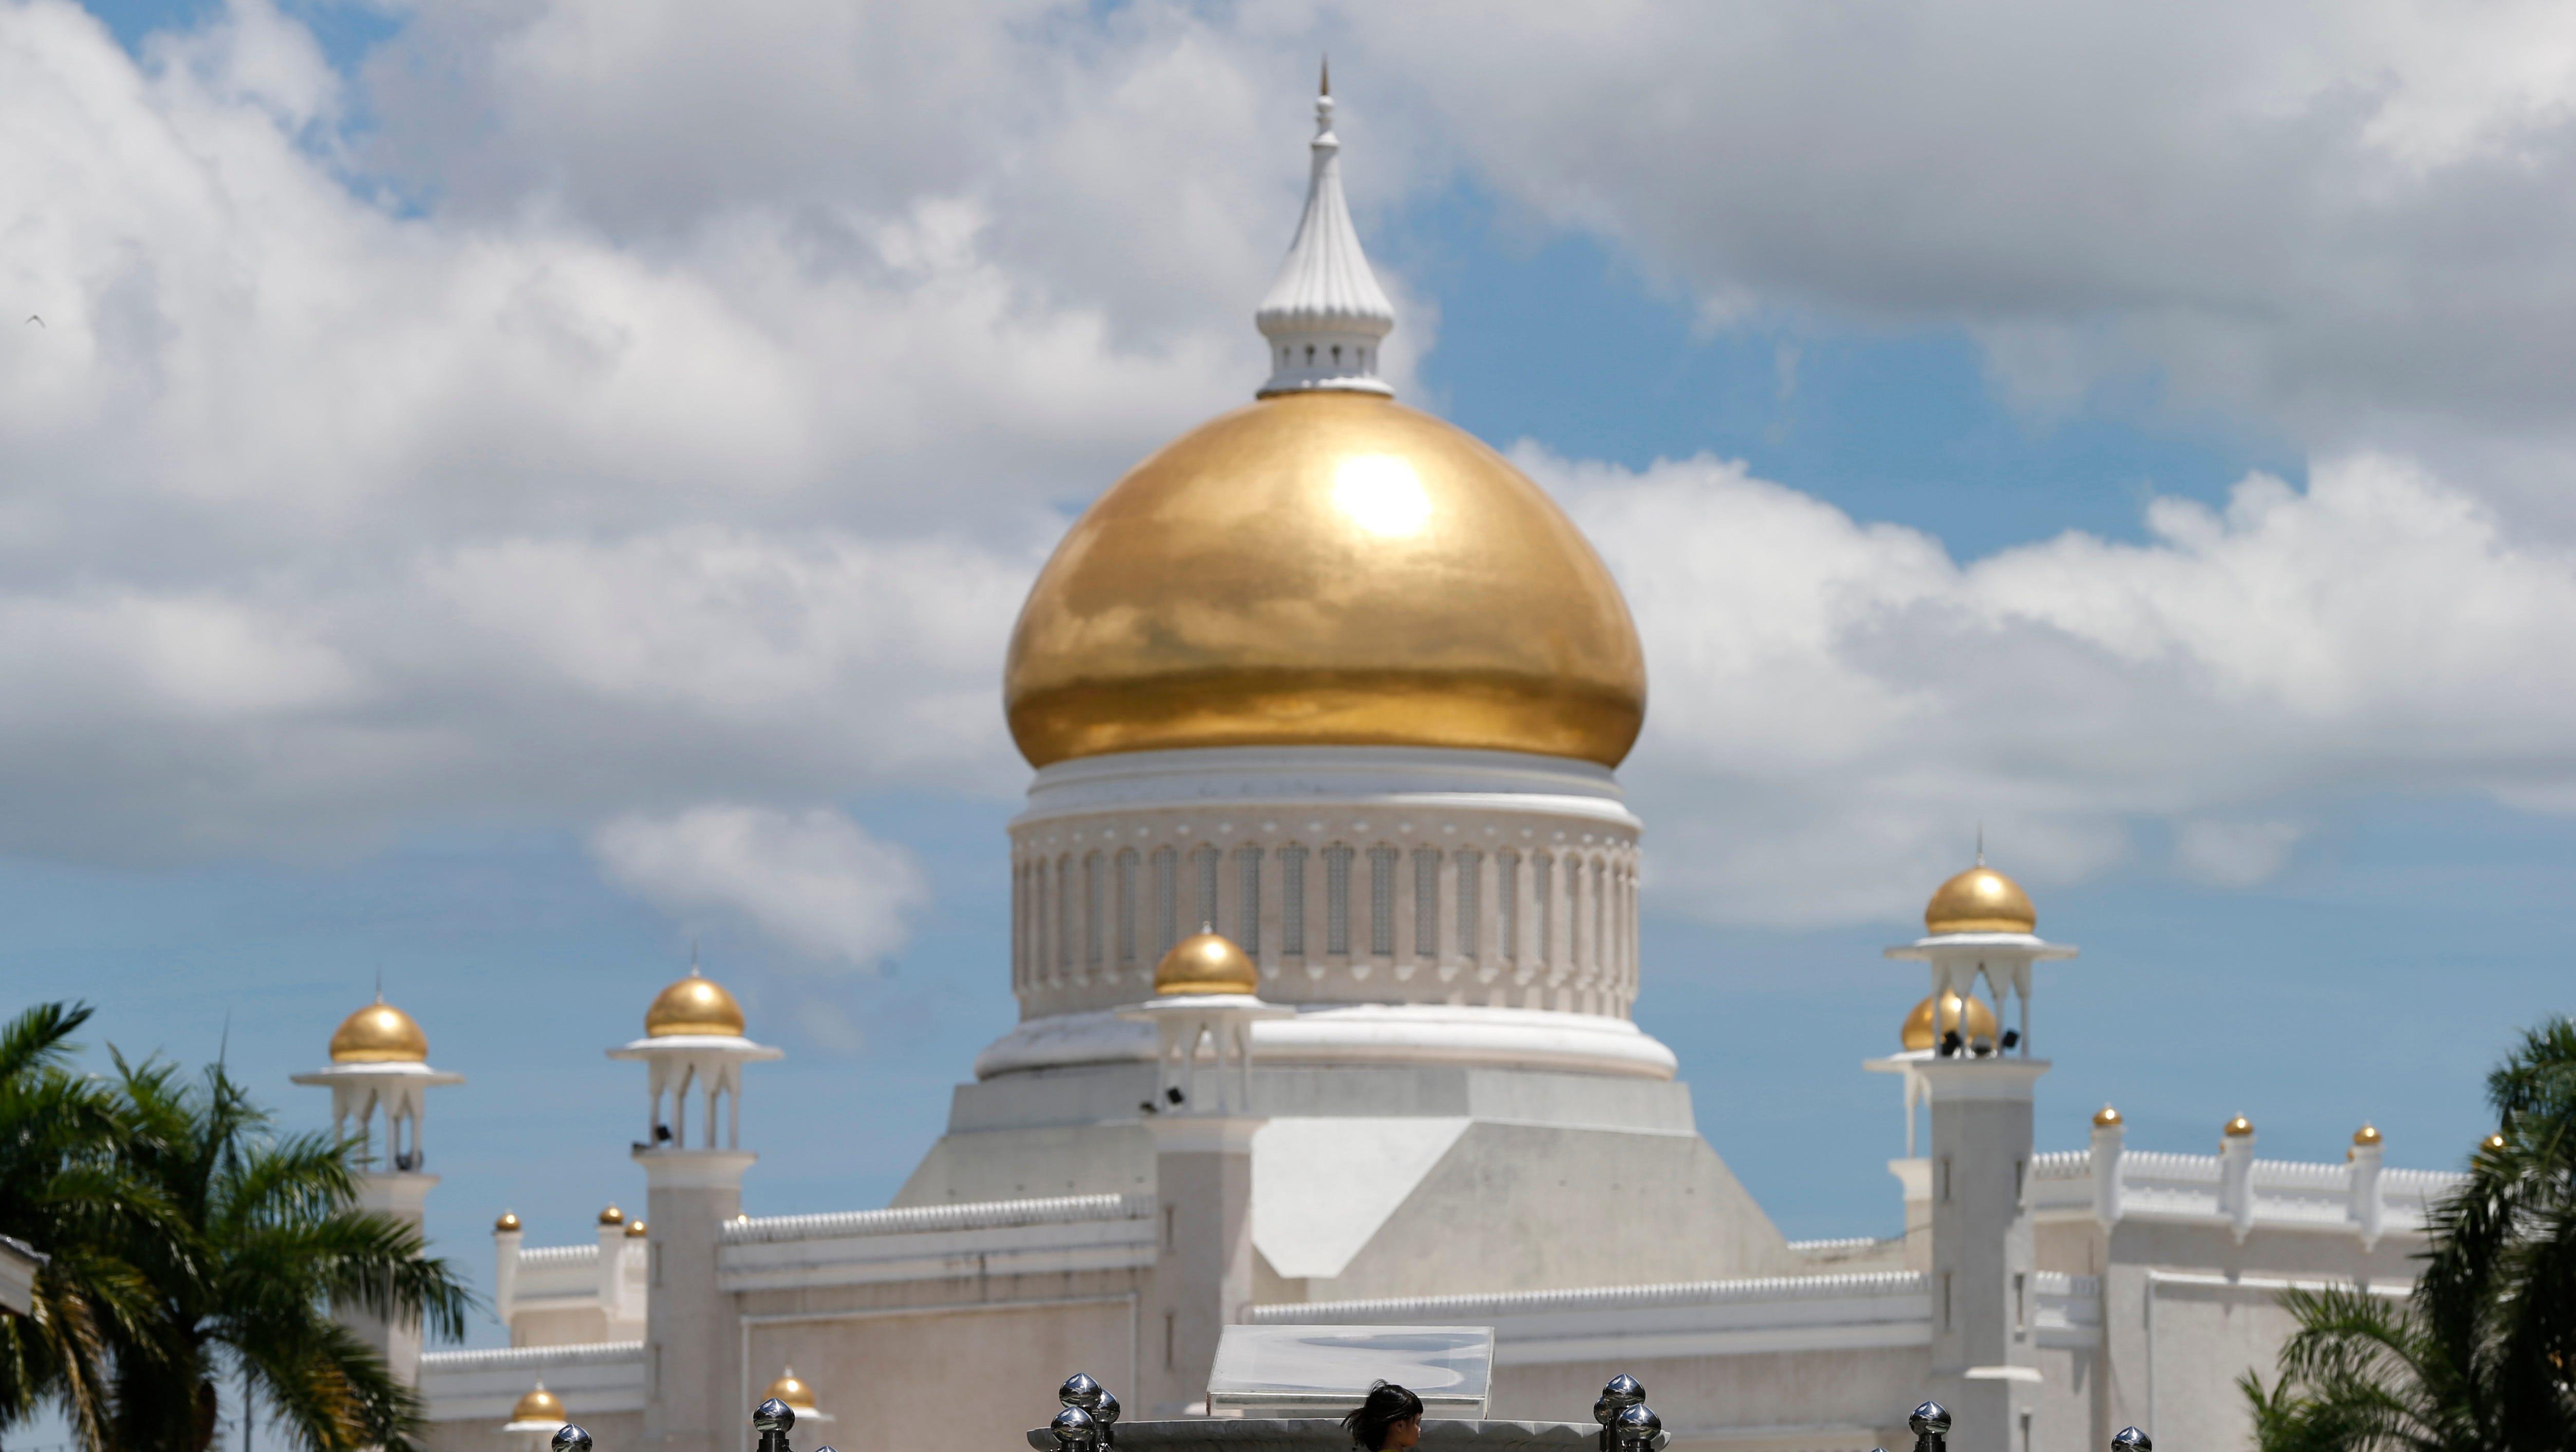 Sultan Omar Ali Saifuddien Mosque in Bandar Seri Begawan, Brunei.